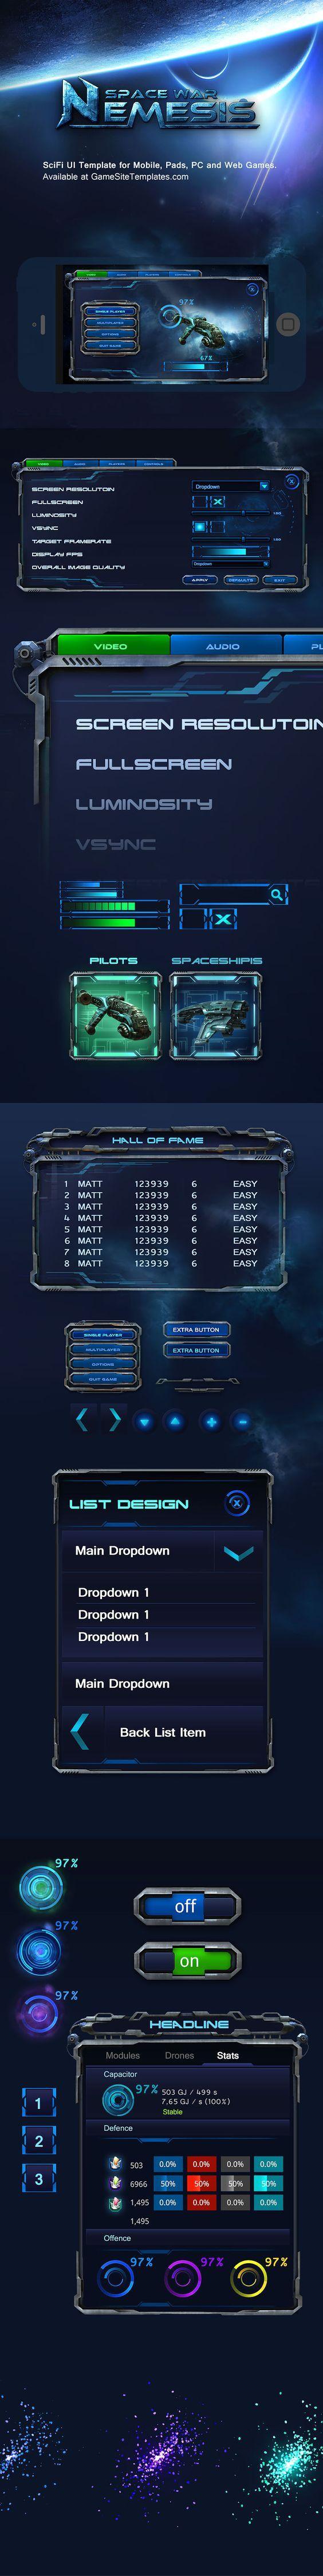 SpaceWar-SciFi-Mobile-Game-GUI-Interface-04 by karsten.deviantart.com on @deviantART: